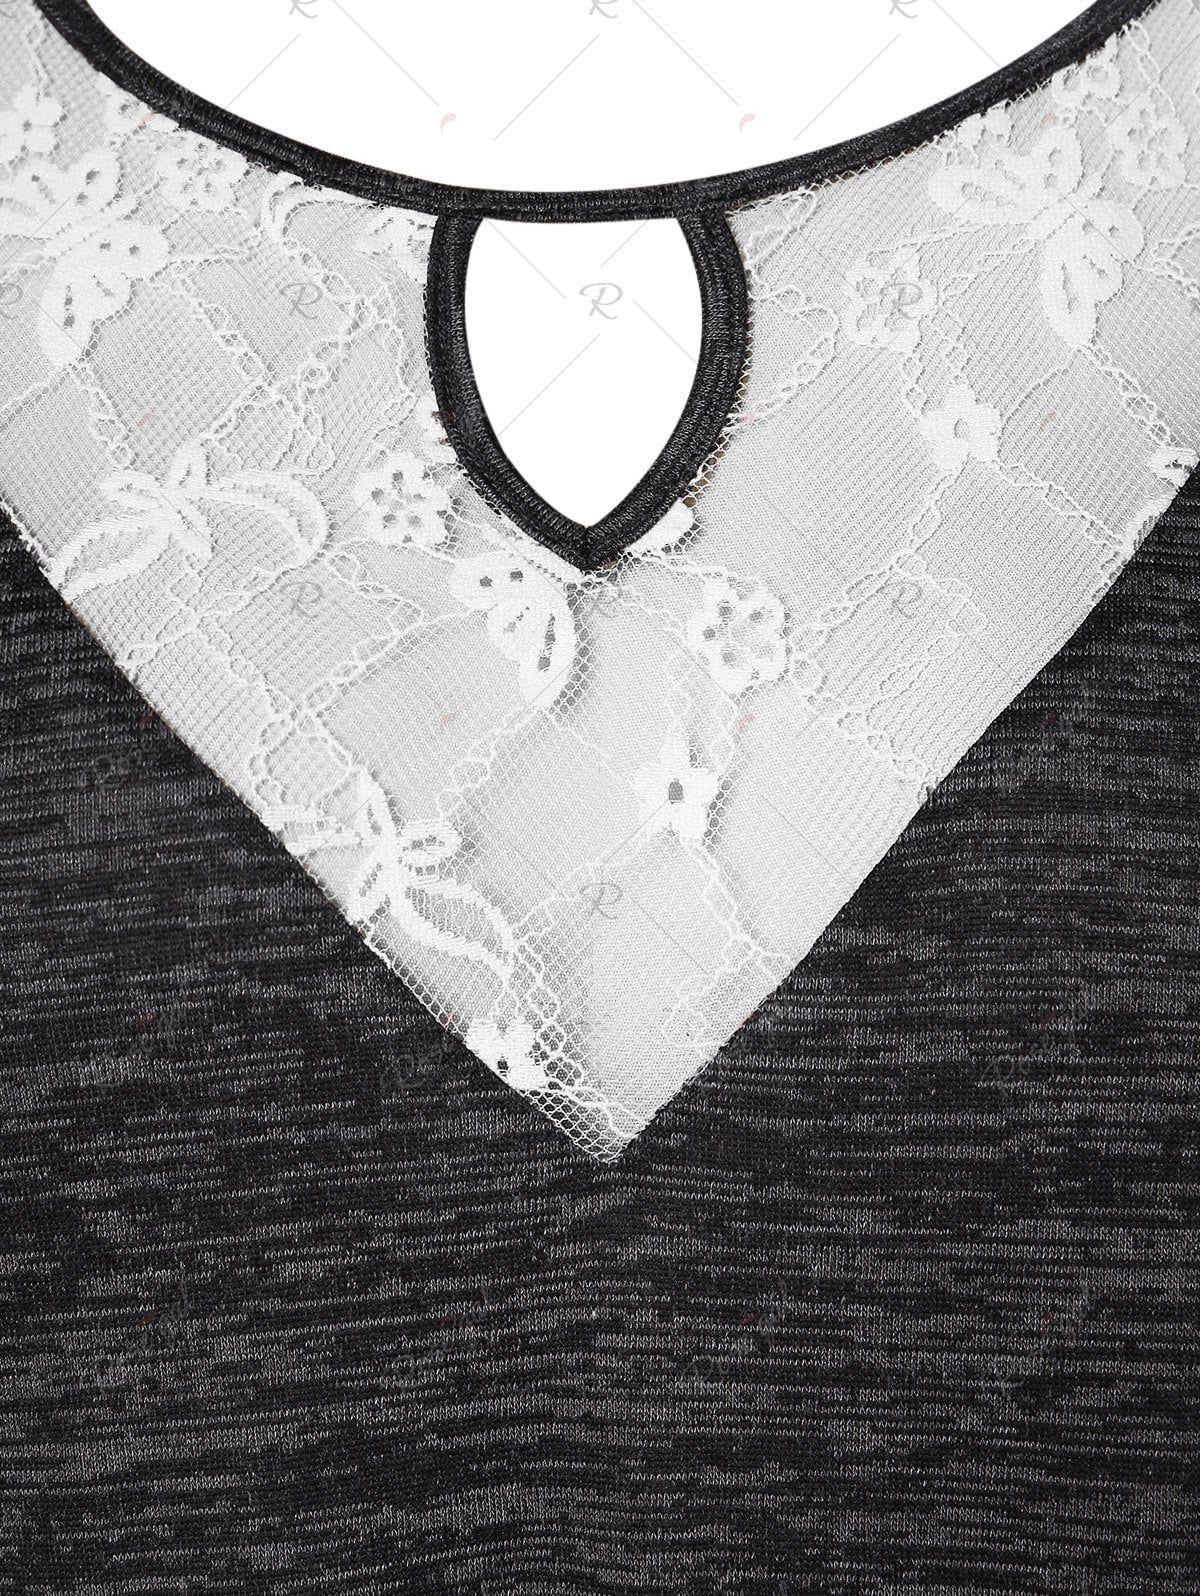 Plus Size Lace Panel Keyhole T Shirt Lace Panelled Lace Insert Lace